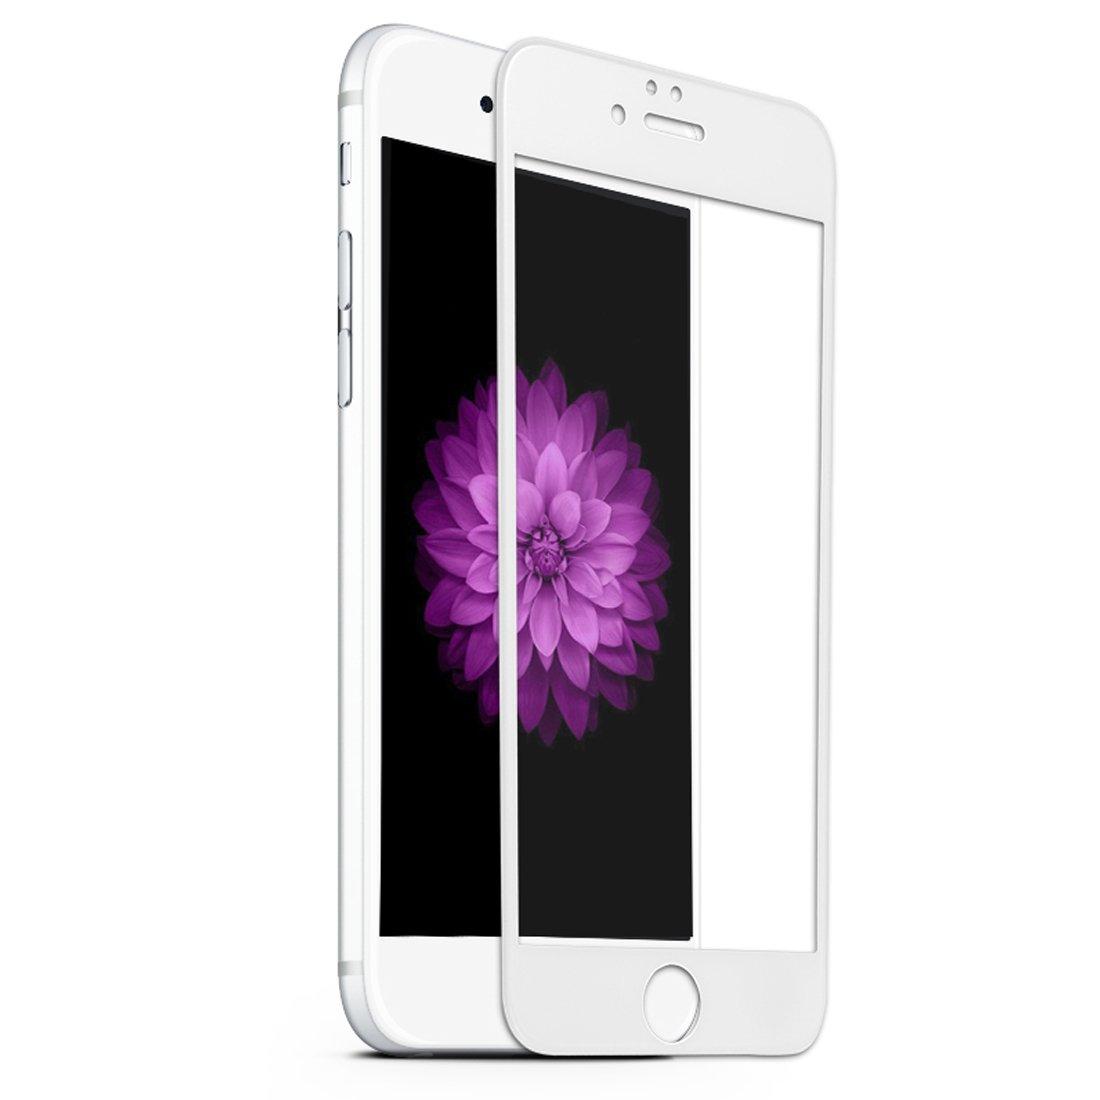 3D Full Screen ochranné sklo pre iPhone 6 / 6S Plus 1